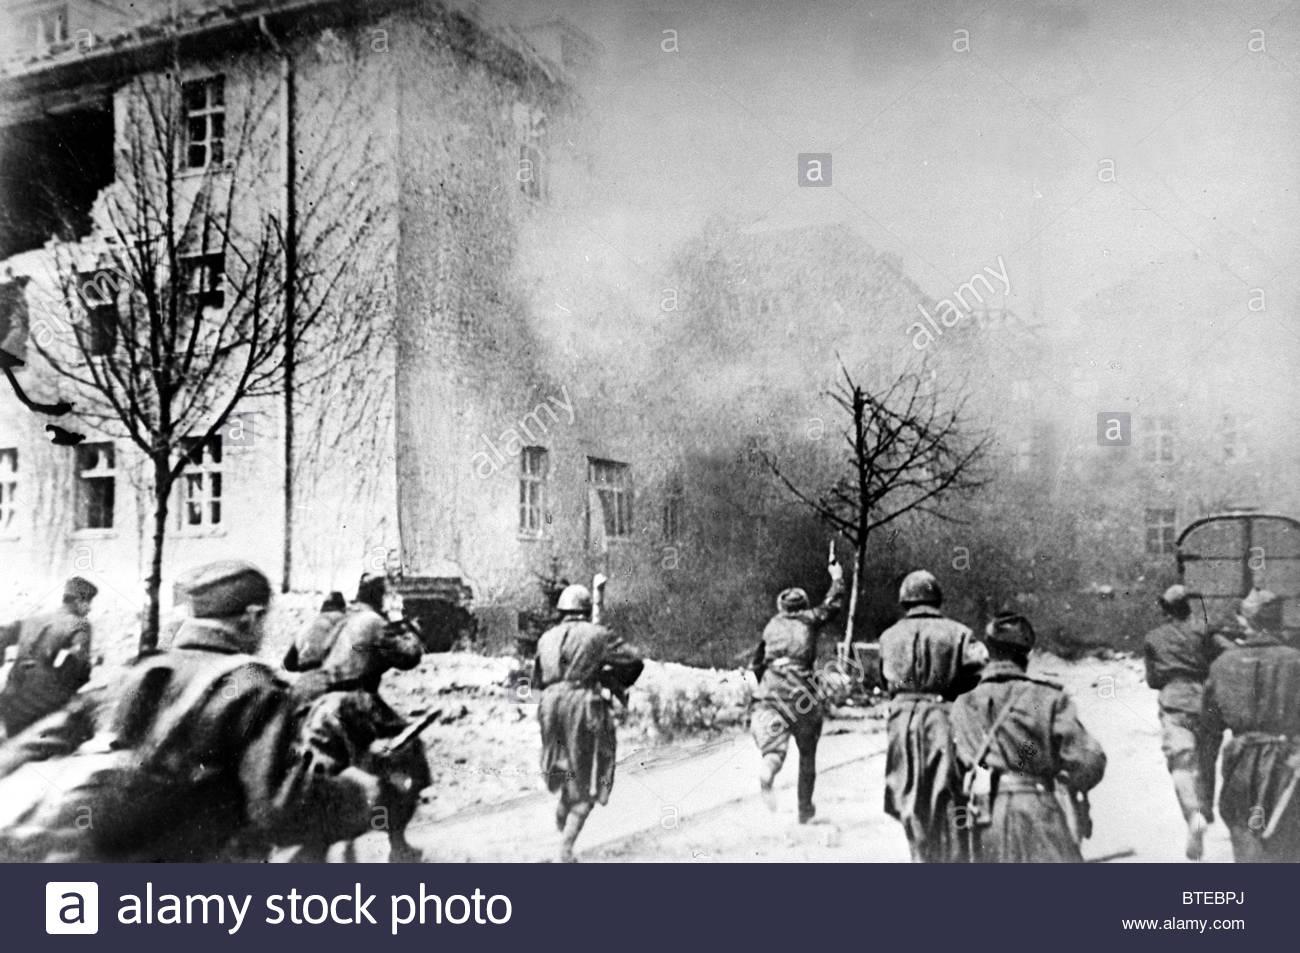 Great Patriotic War  Koenigsberg, 1945 Stock Photo: 32278698 - Alamy